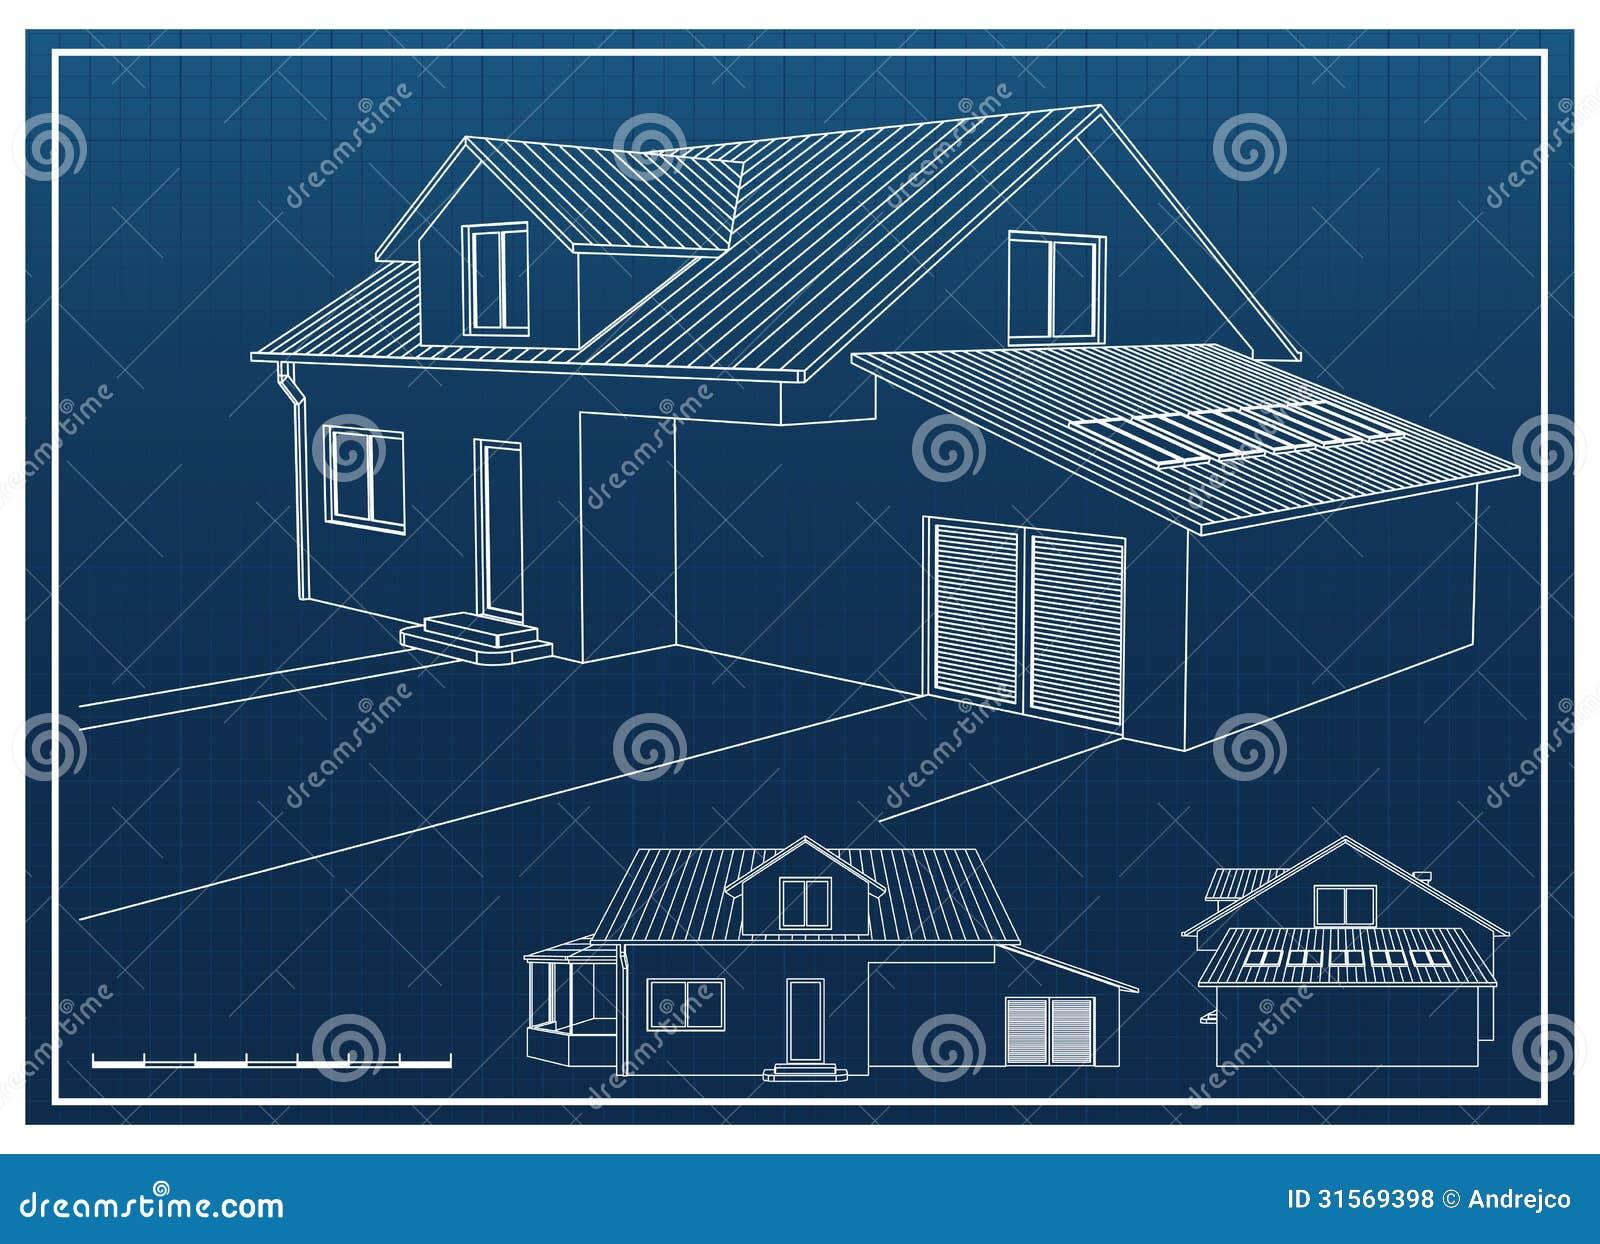 House blueprint stock vector illustration of architect 31569398 royalty free stock photo malvernweather Images